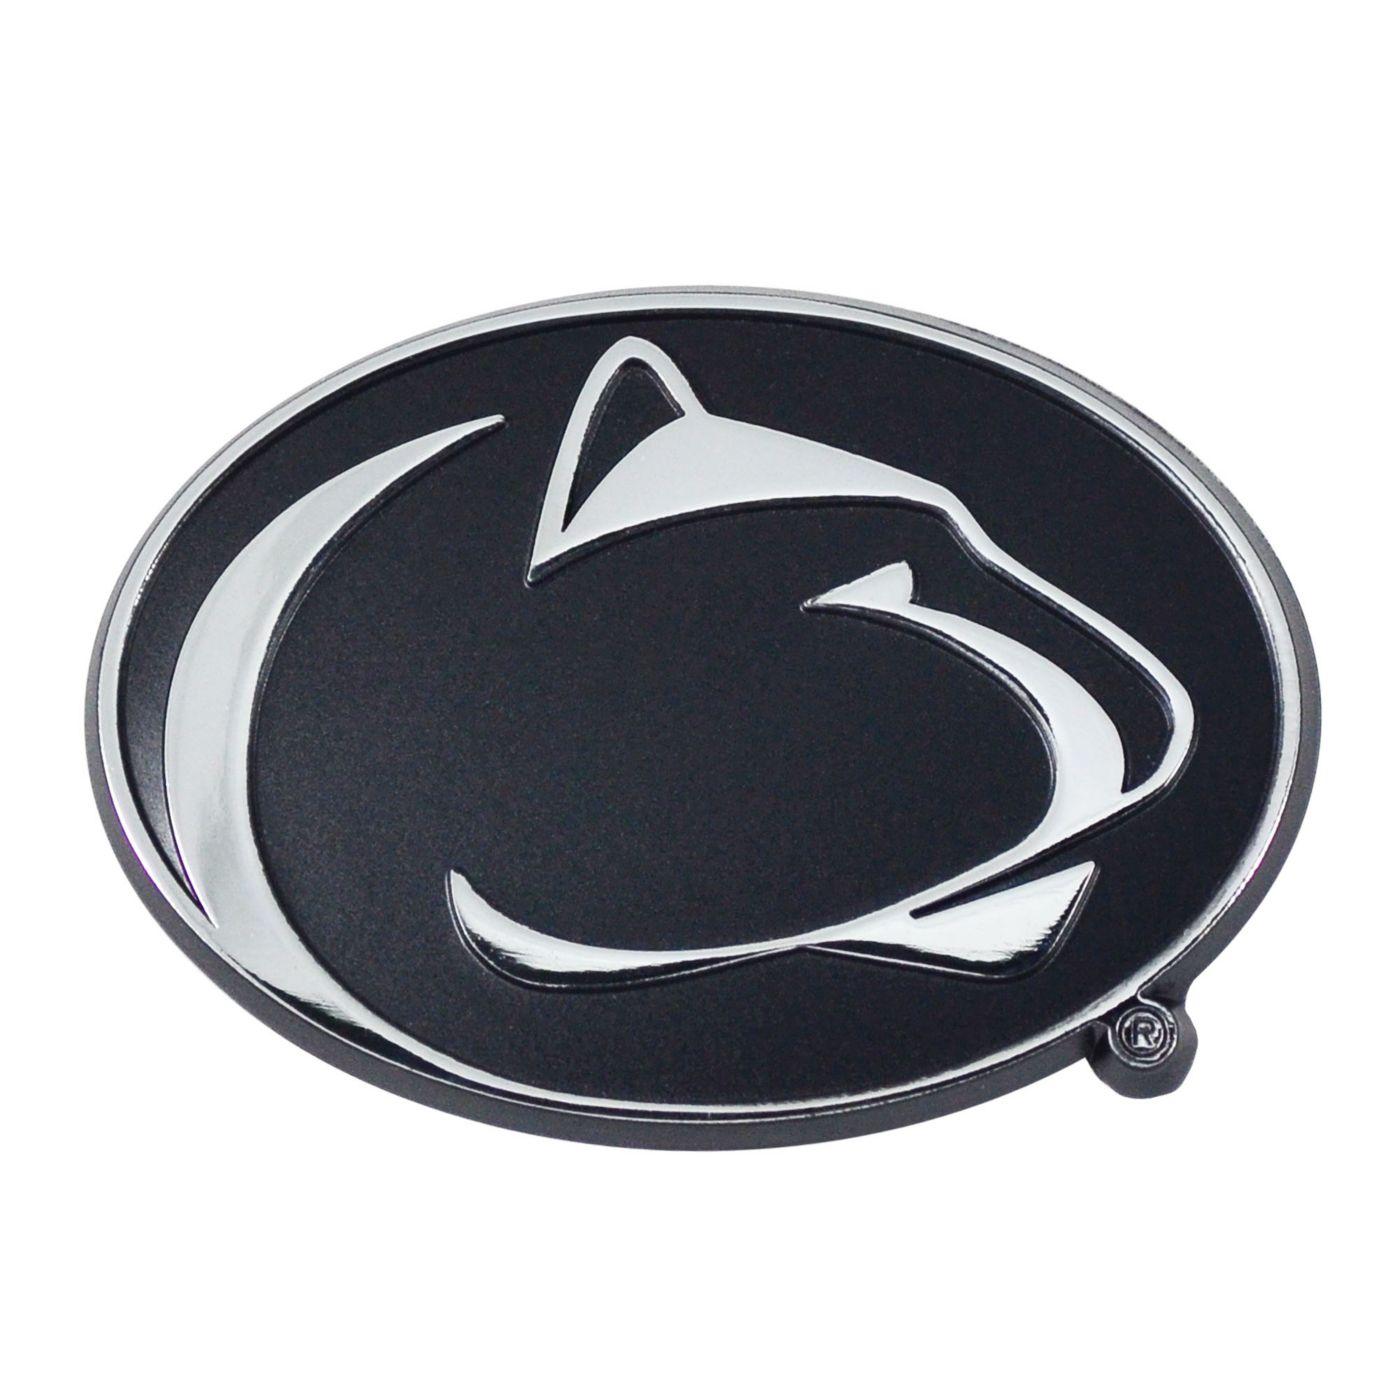 FANMATS Penn State Nittany Lions Chrome Emblem